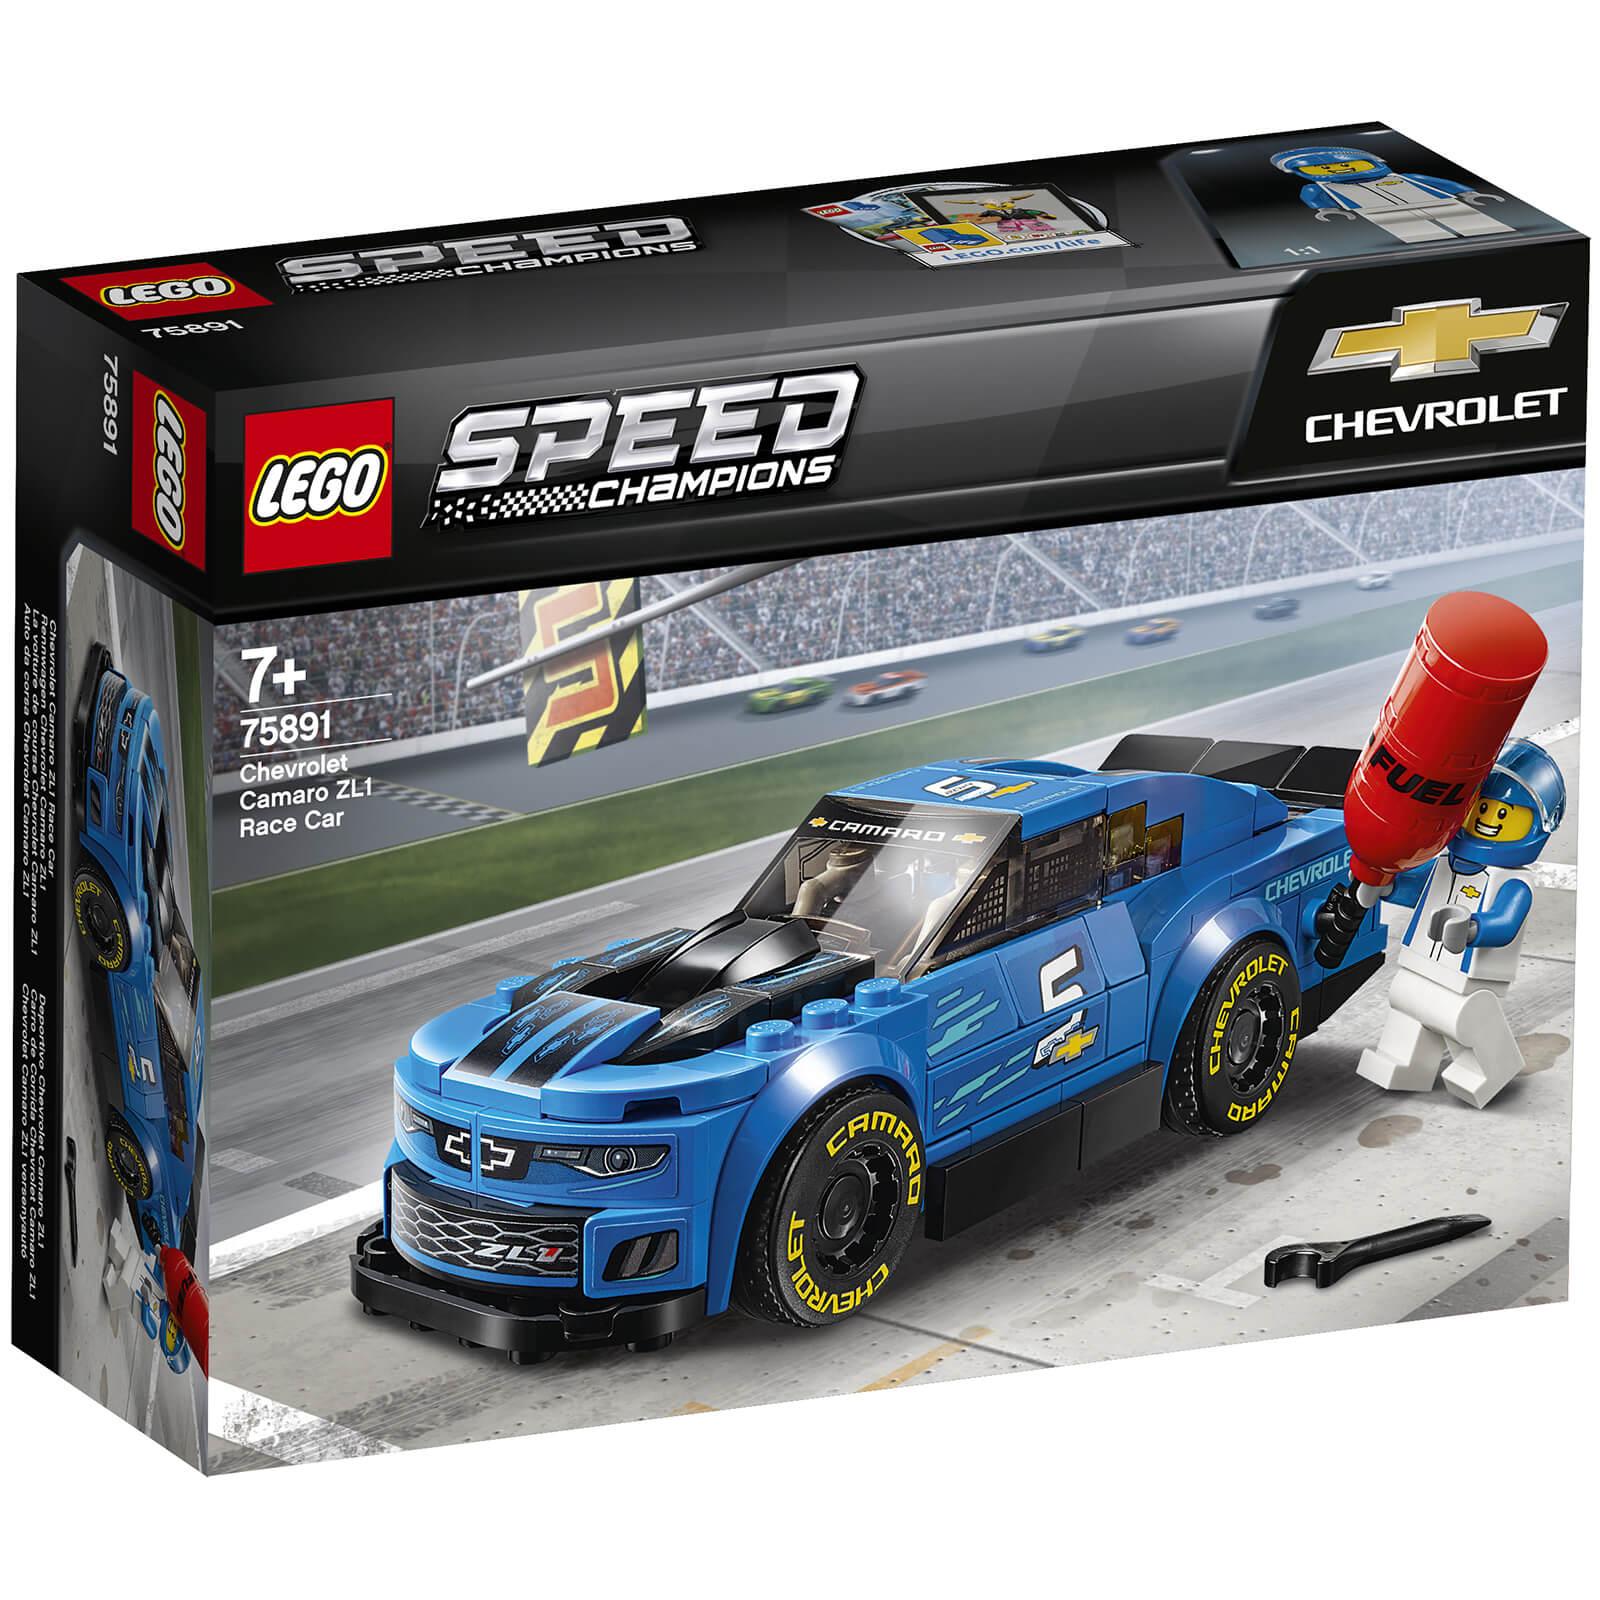 Image of 75891 LEGO® SPEED CHAMPIONS Racing Car Chevrolet Camaro ZL1